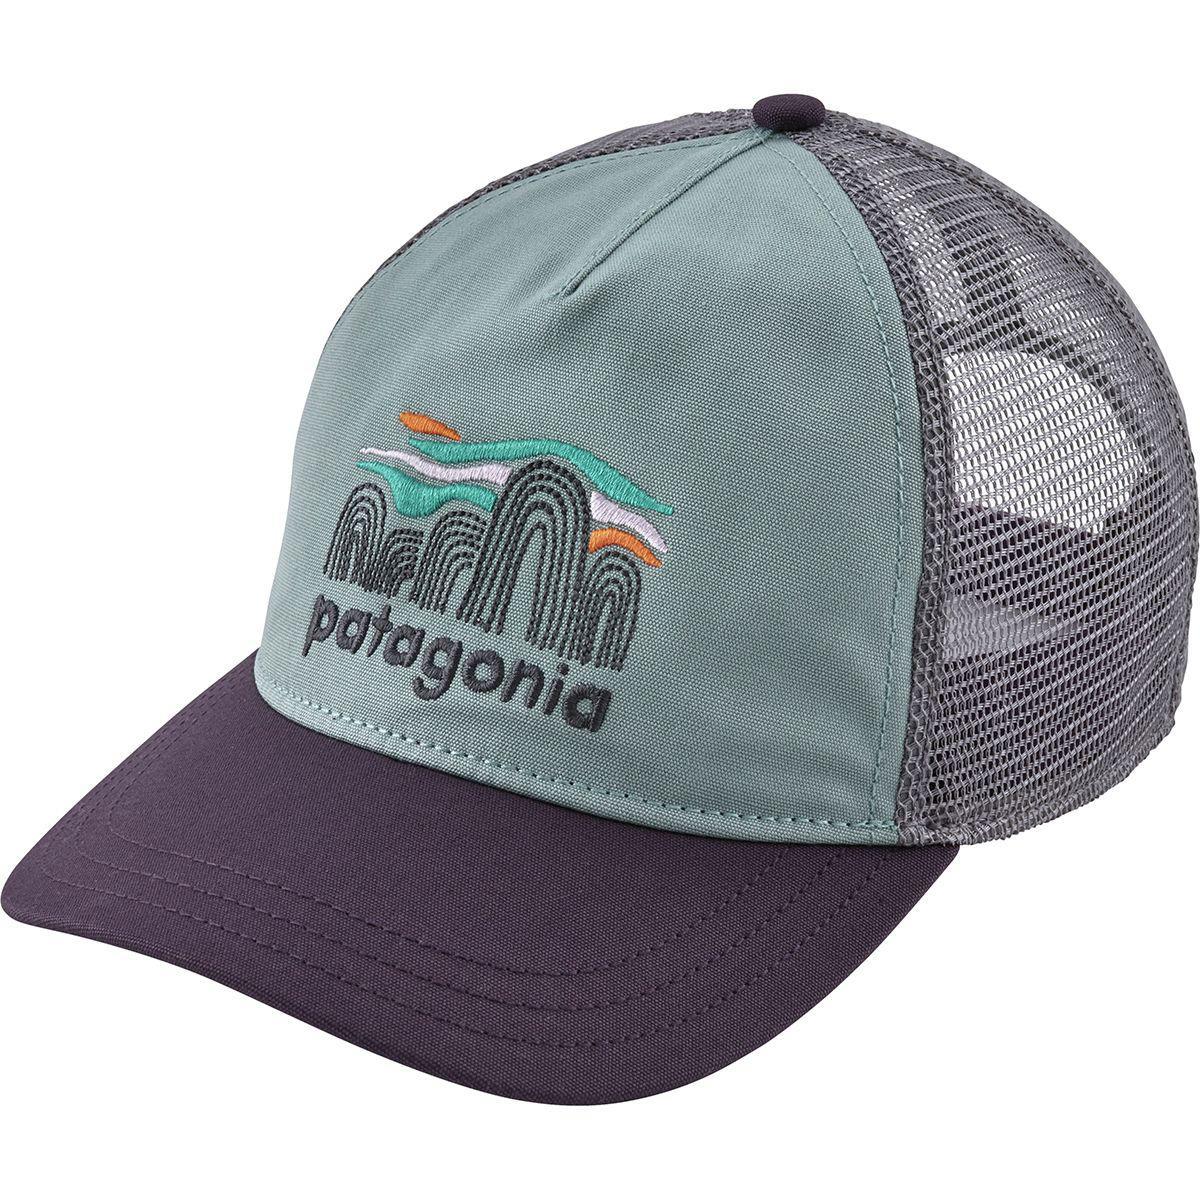 3634d7ce60b Patagonia - Blue Fitz Roy Boulders Layback Trucker Hat - Lyst. View  fullscreen